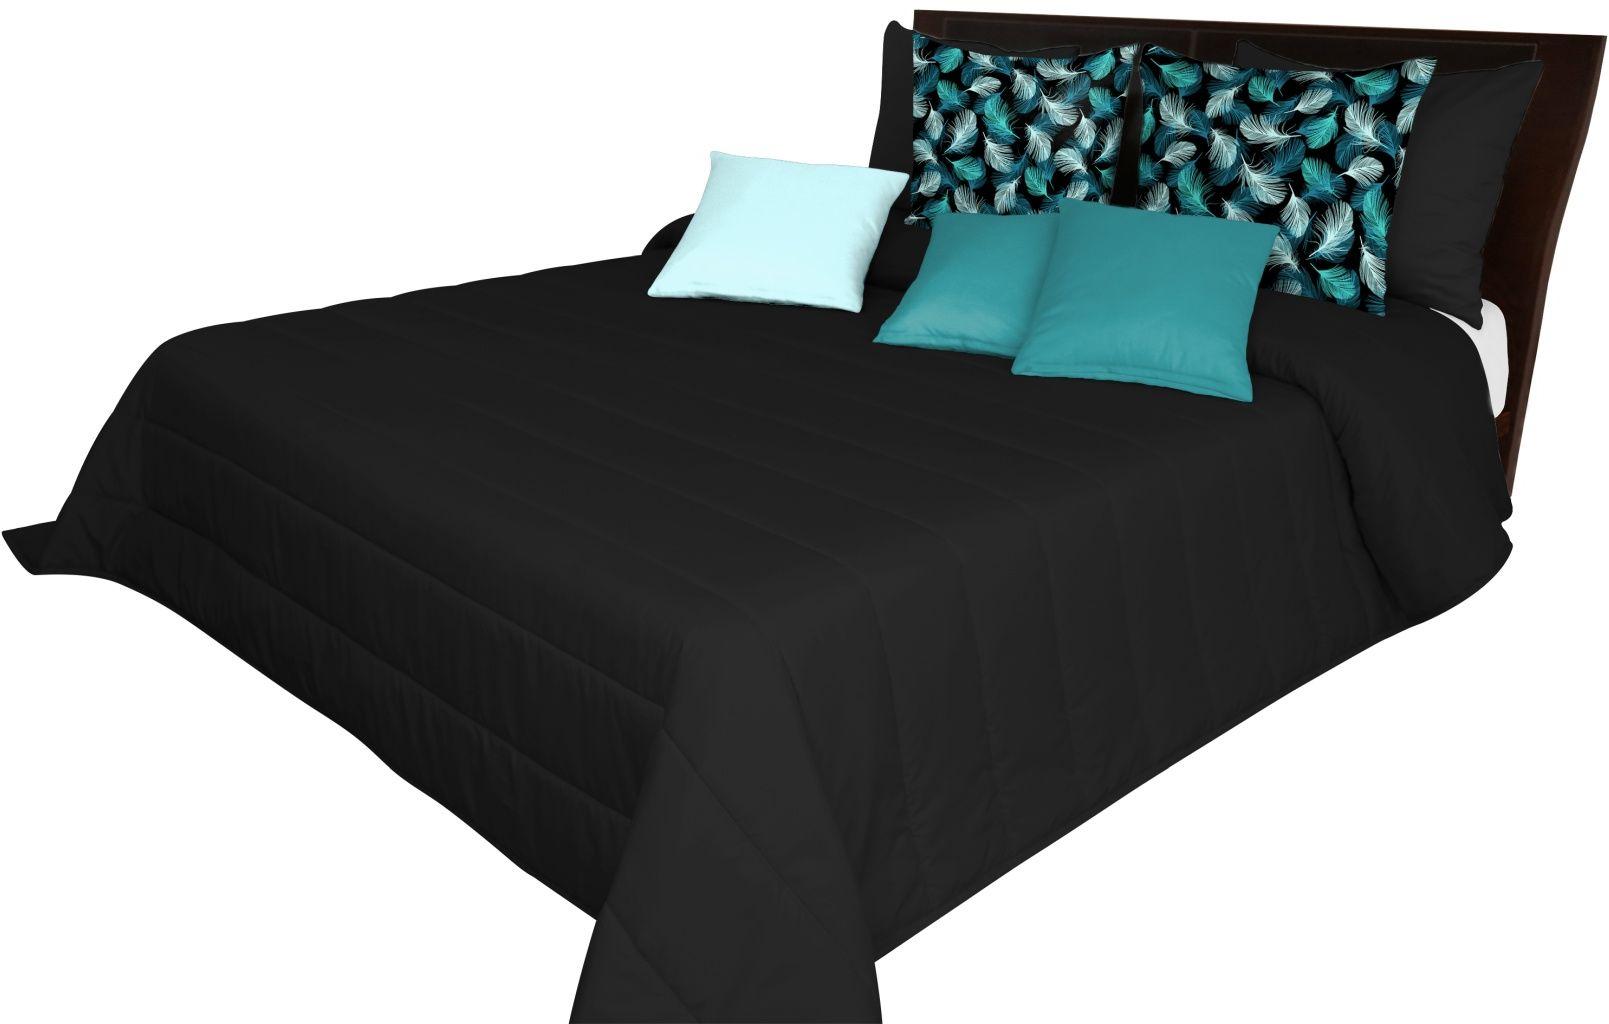 Narzuta pikowana na łóżko NMF-05 Mariall